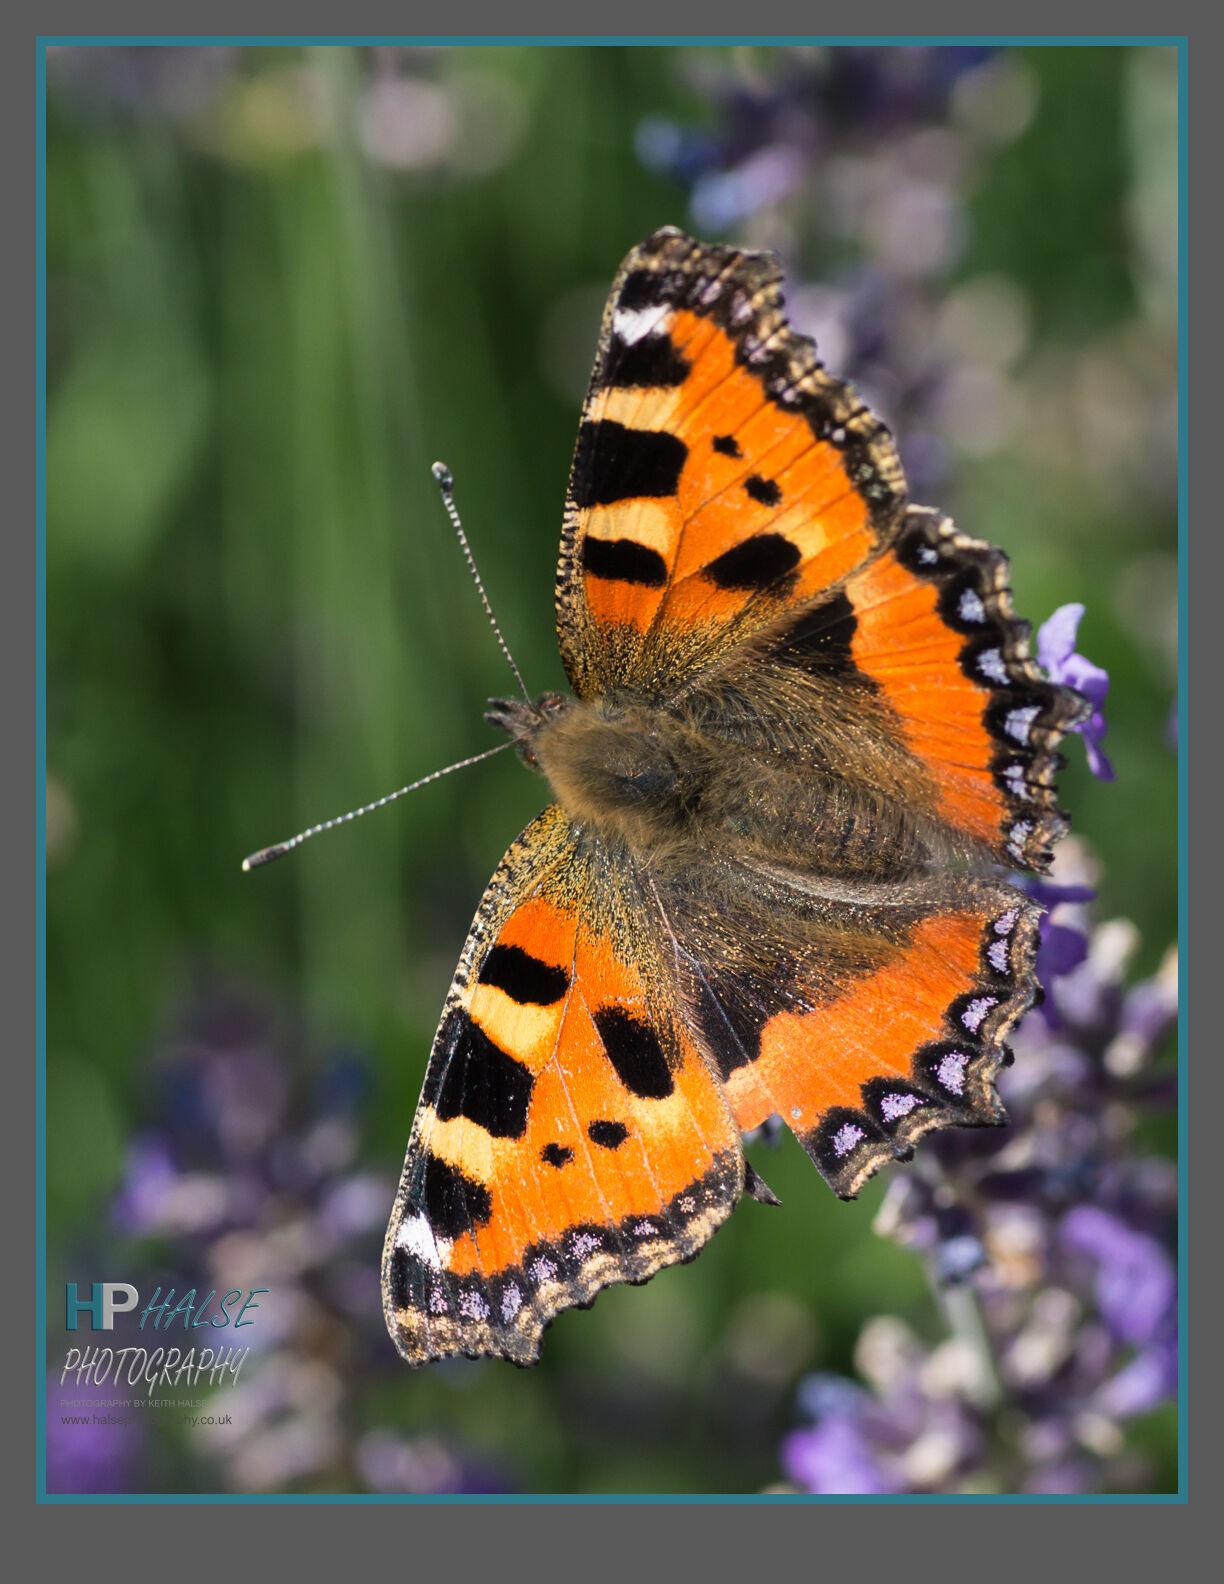 009 Small Tortoiseshell Butterfly